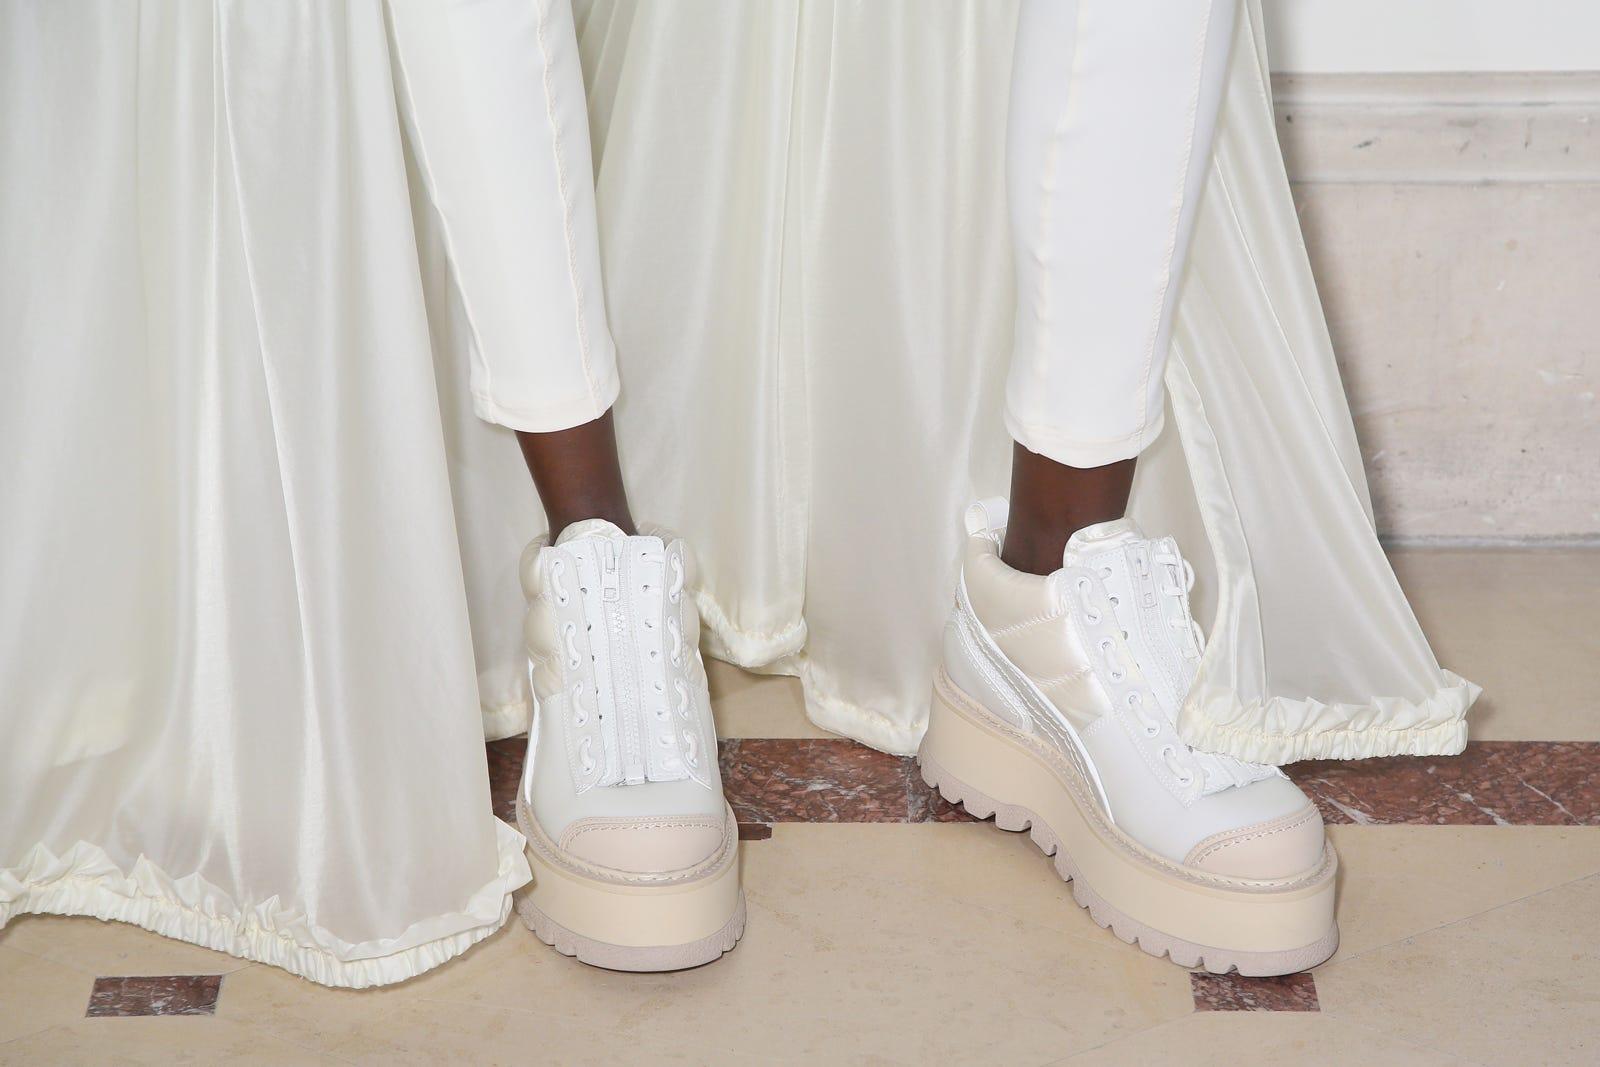 wholesale dealer b7e0f 73e7c Rihanna Fenty Spring 2017 Puma Shoes Paris Fashion Week